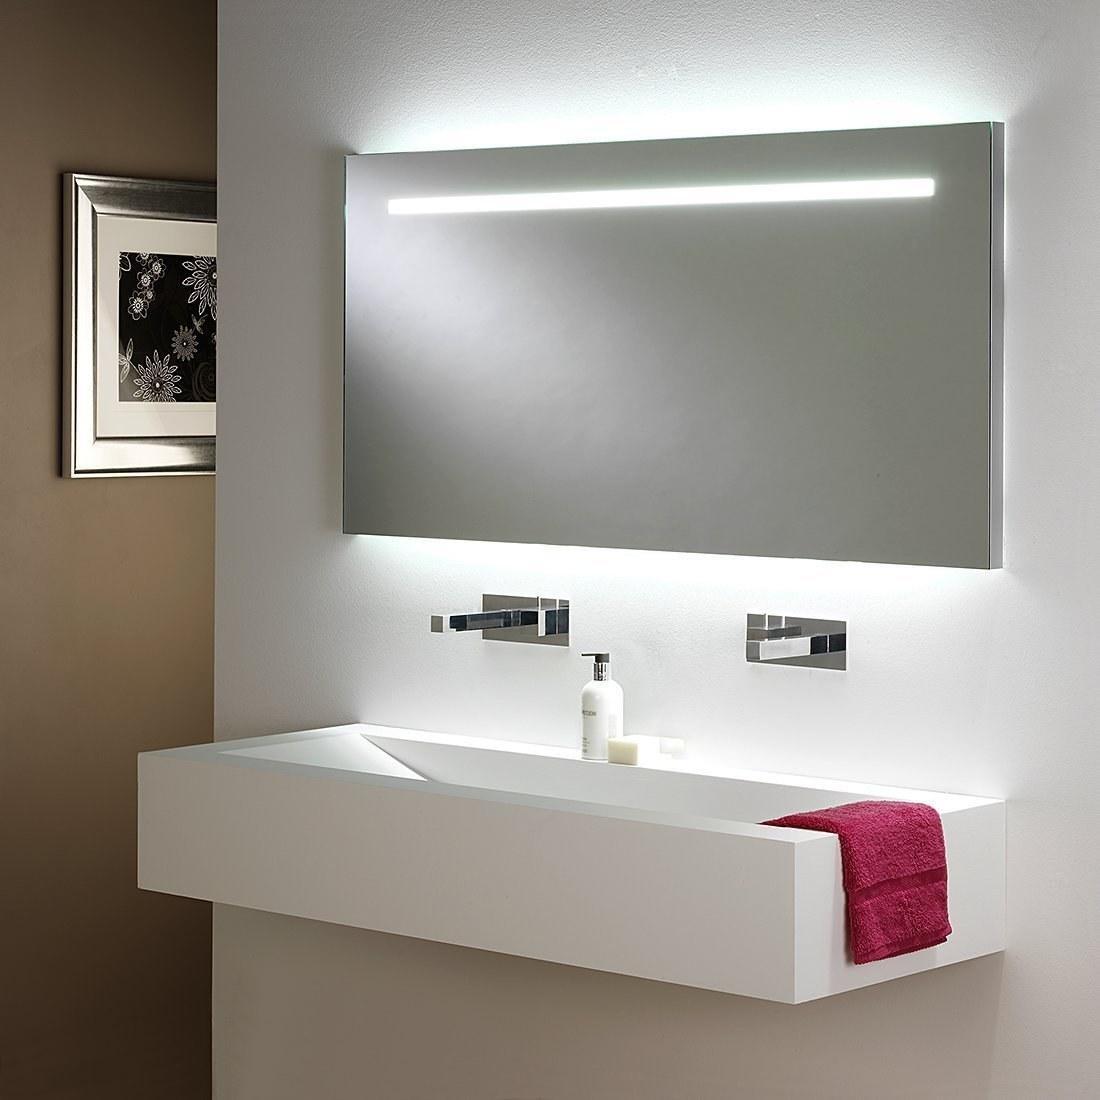 Bathroom Cabinets : Bathroom Mirror Lights Your Style With For Mirrors With Lights For Bathroom (Image 3 of 20)